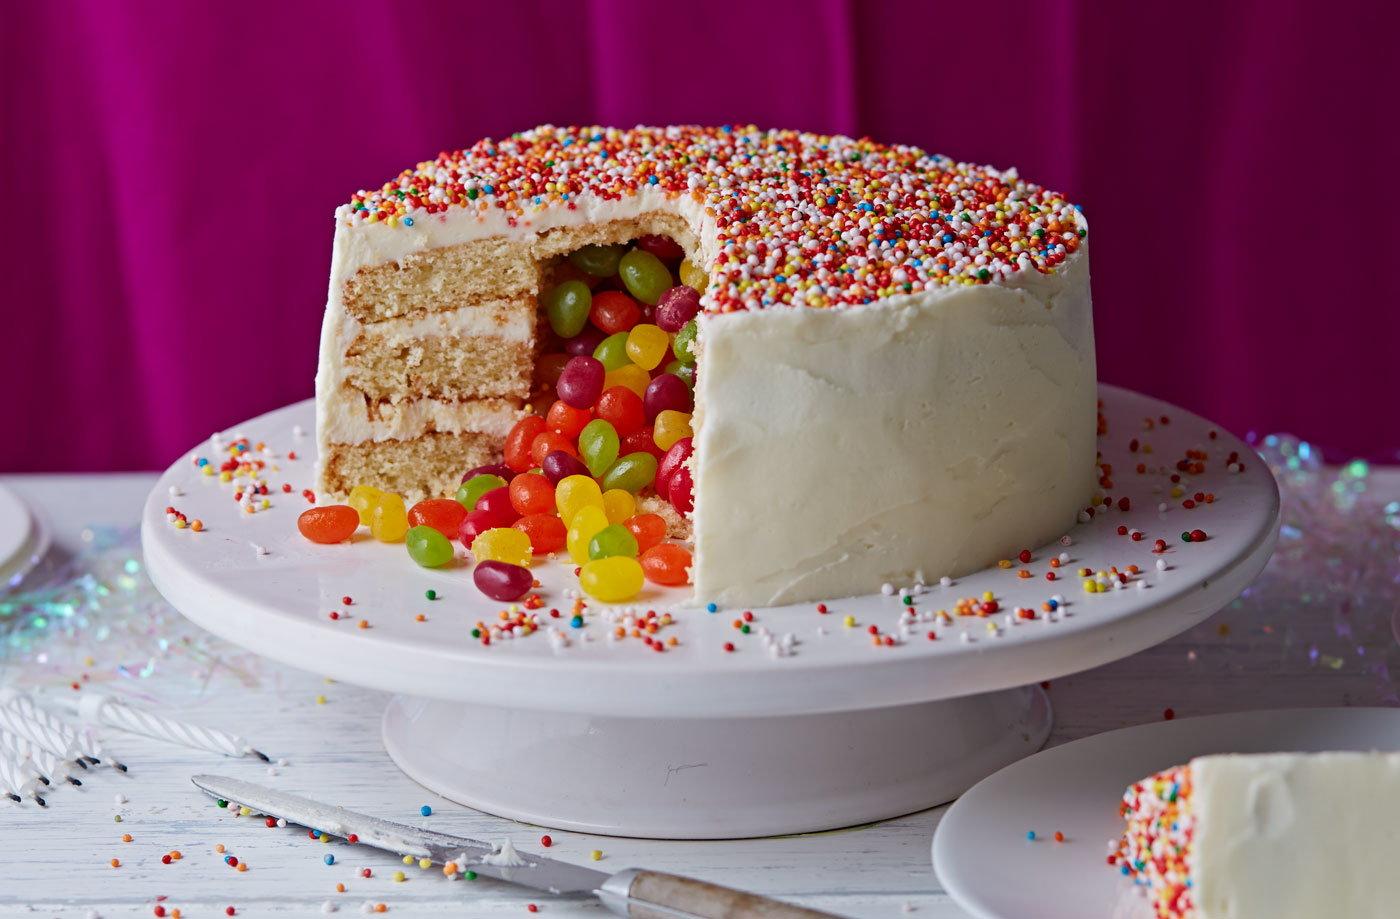 Surprise Pinata Cake